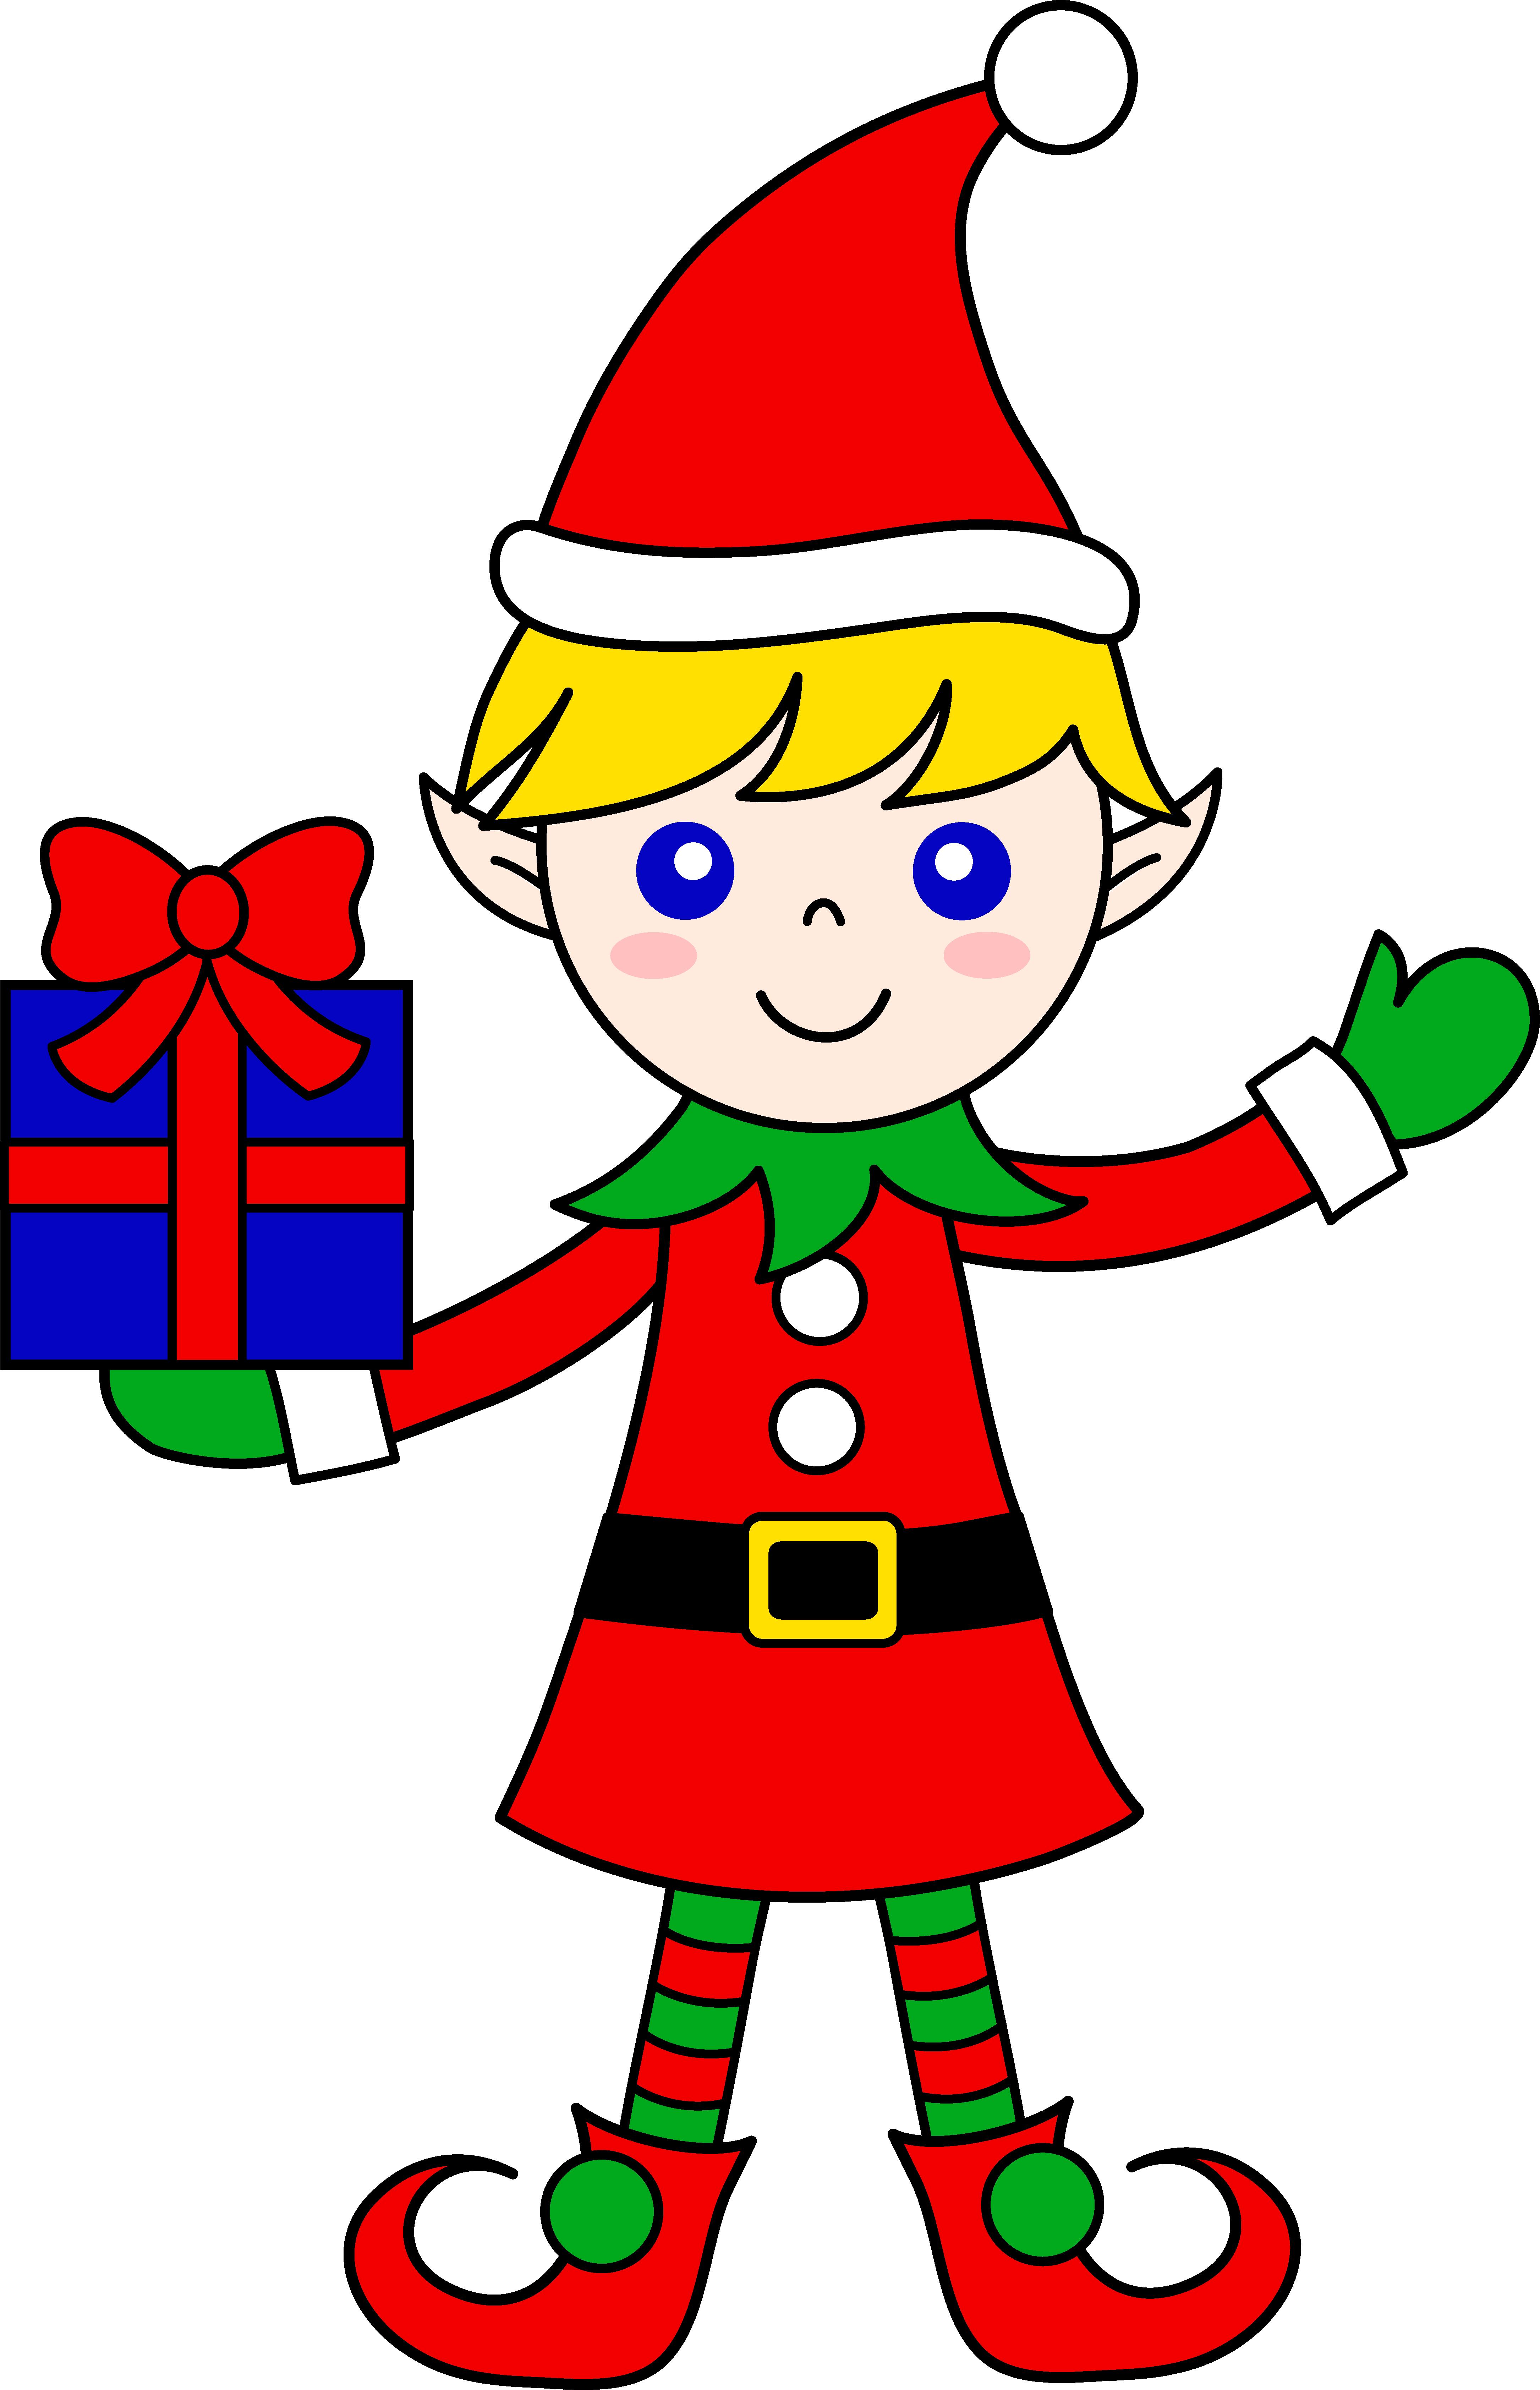 Cute Christmas Elf With Gift Elf Cartoon Santa Clipart Full Size Clipart 2705 Pinclipart